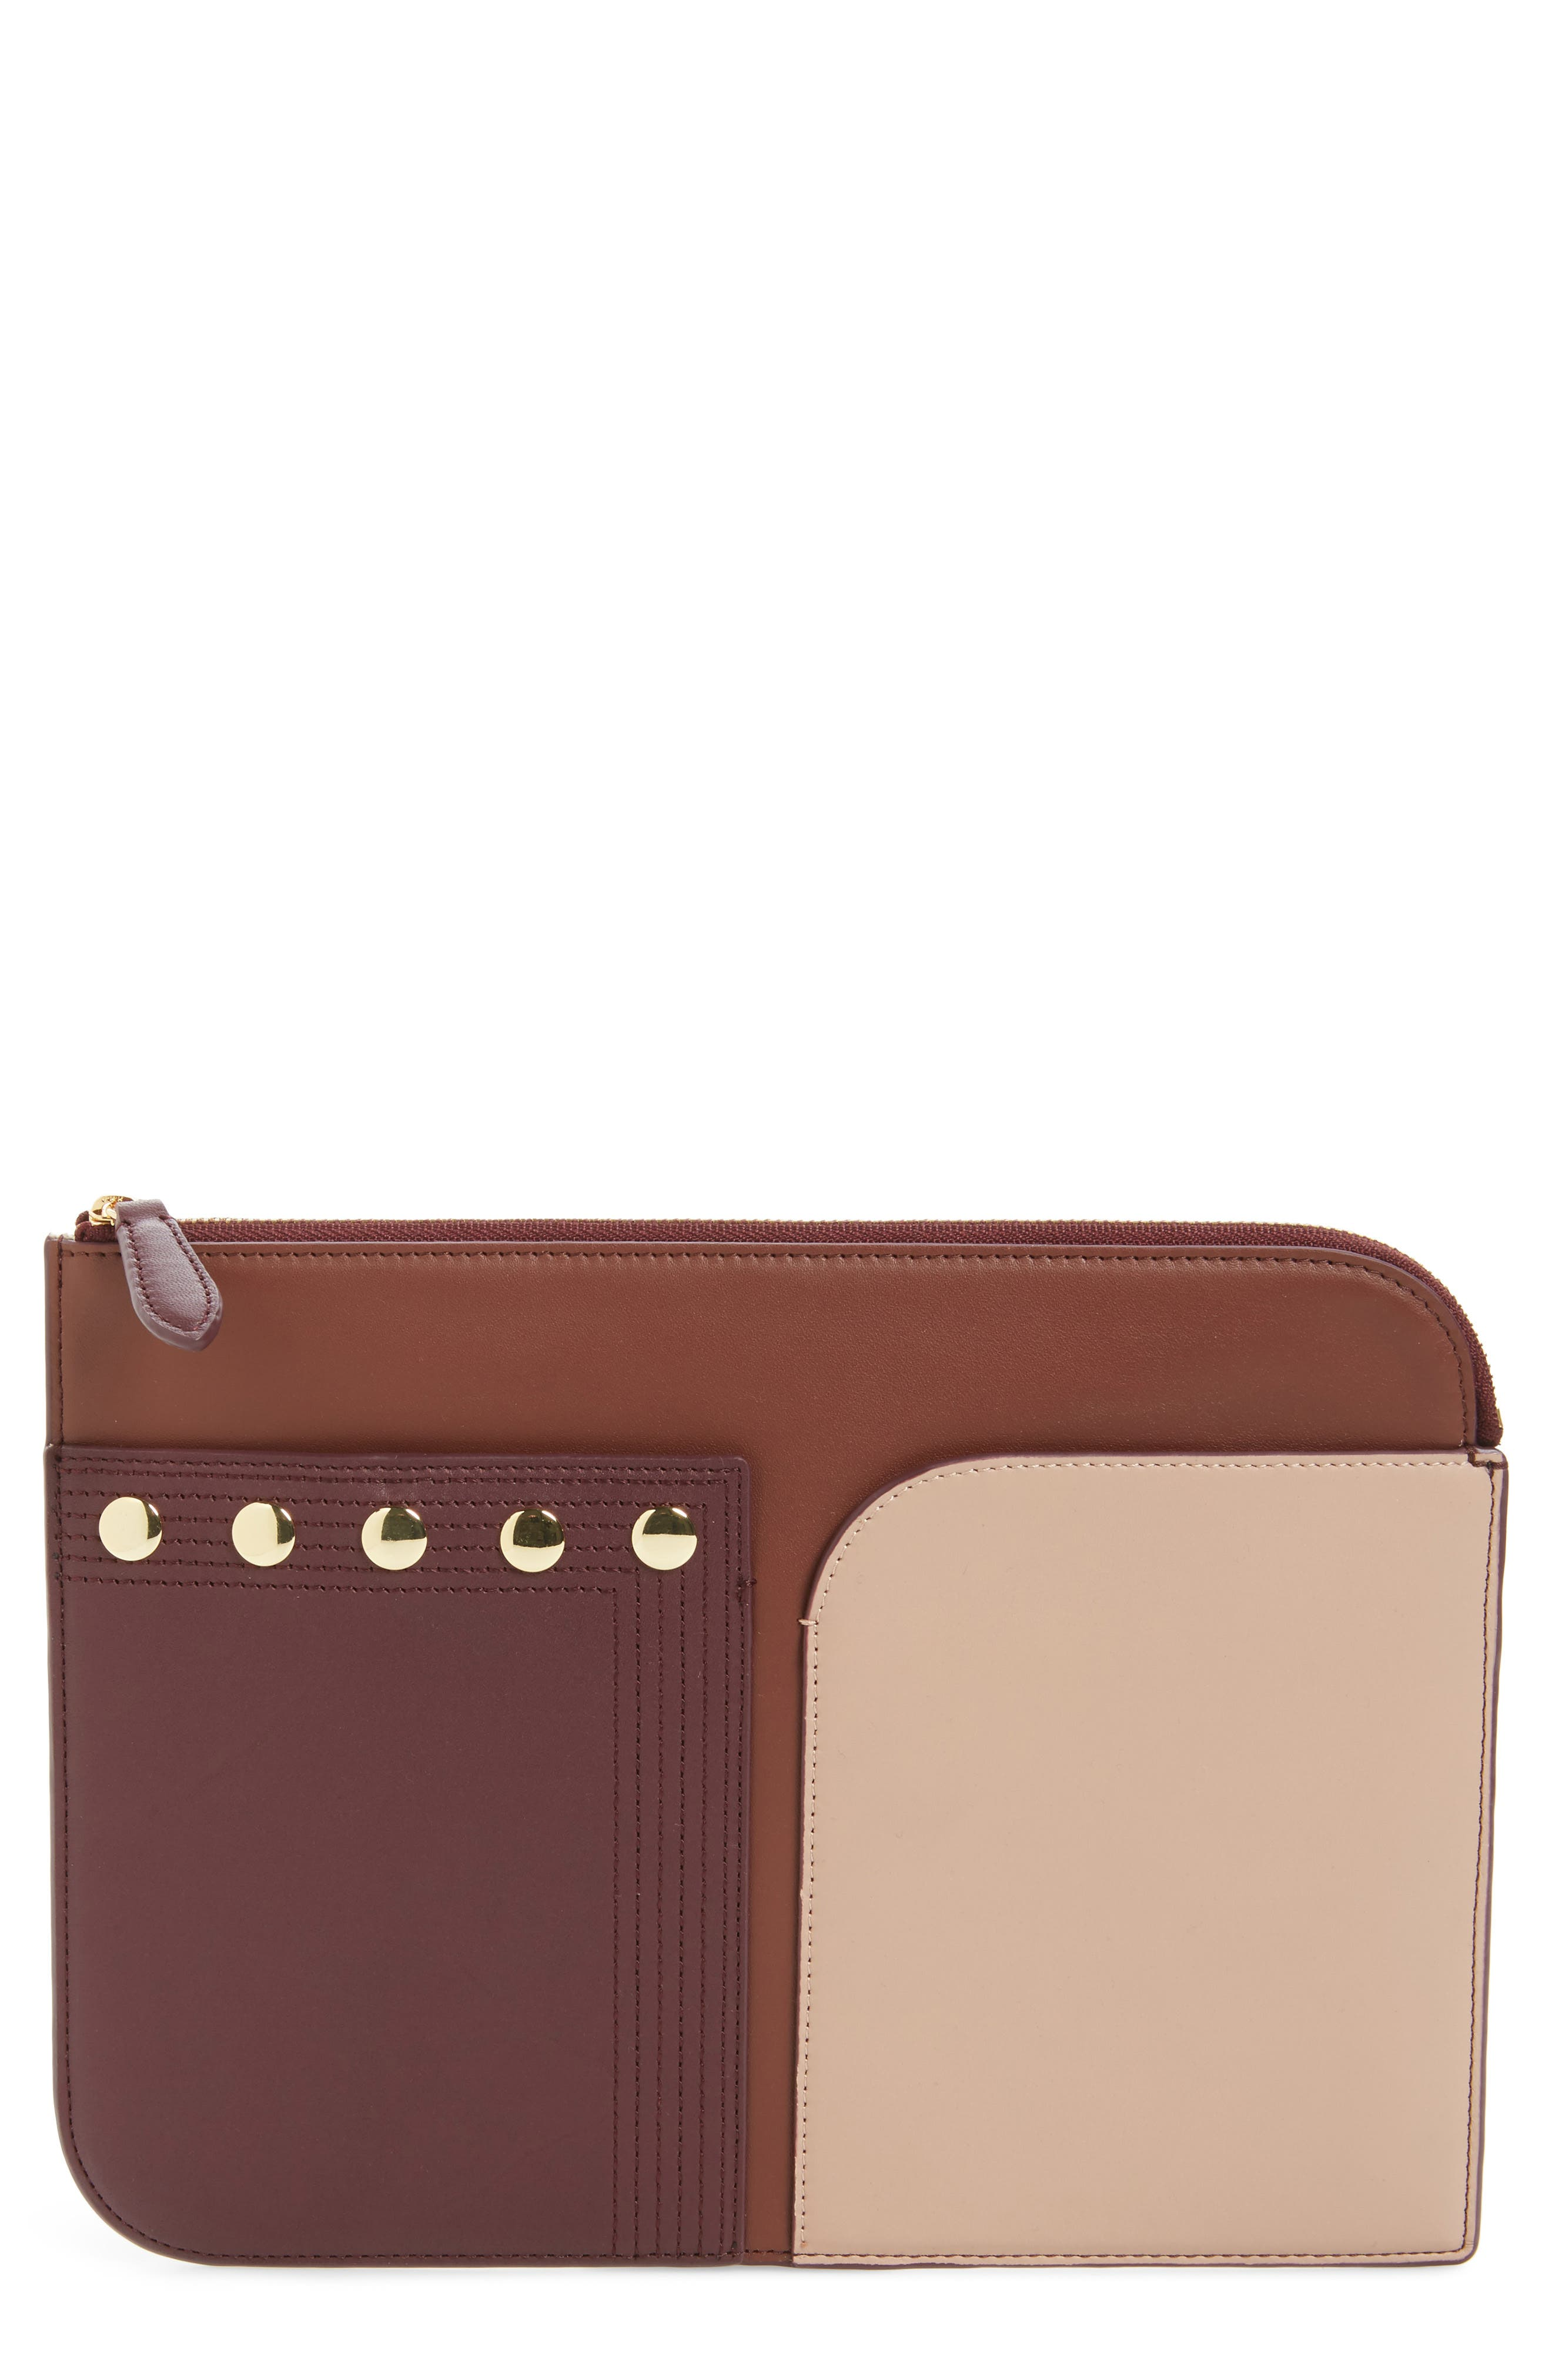 Large Colorblock Leather Zip Pouch,                             Main thumbnail 2, color,